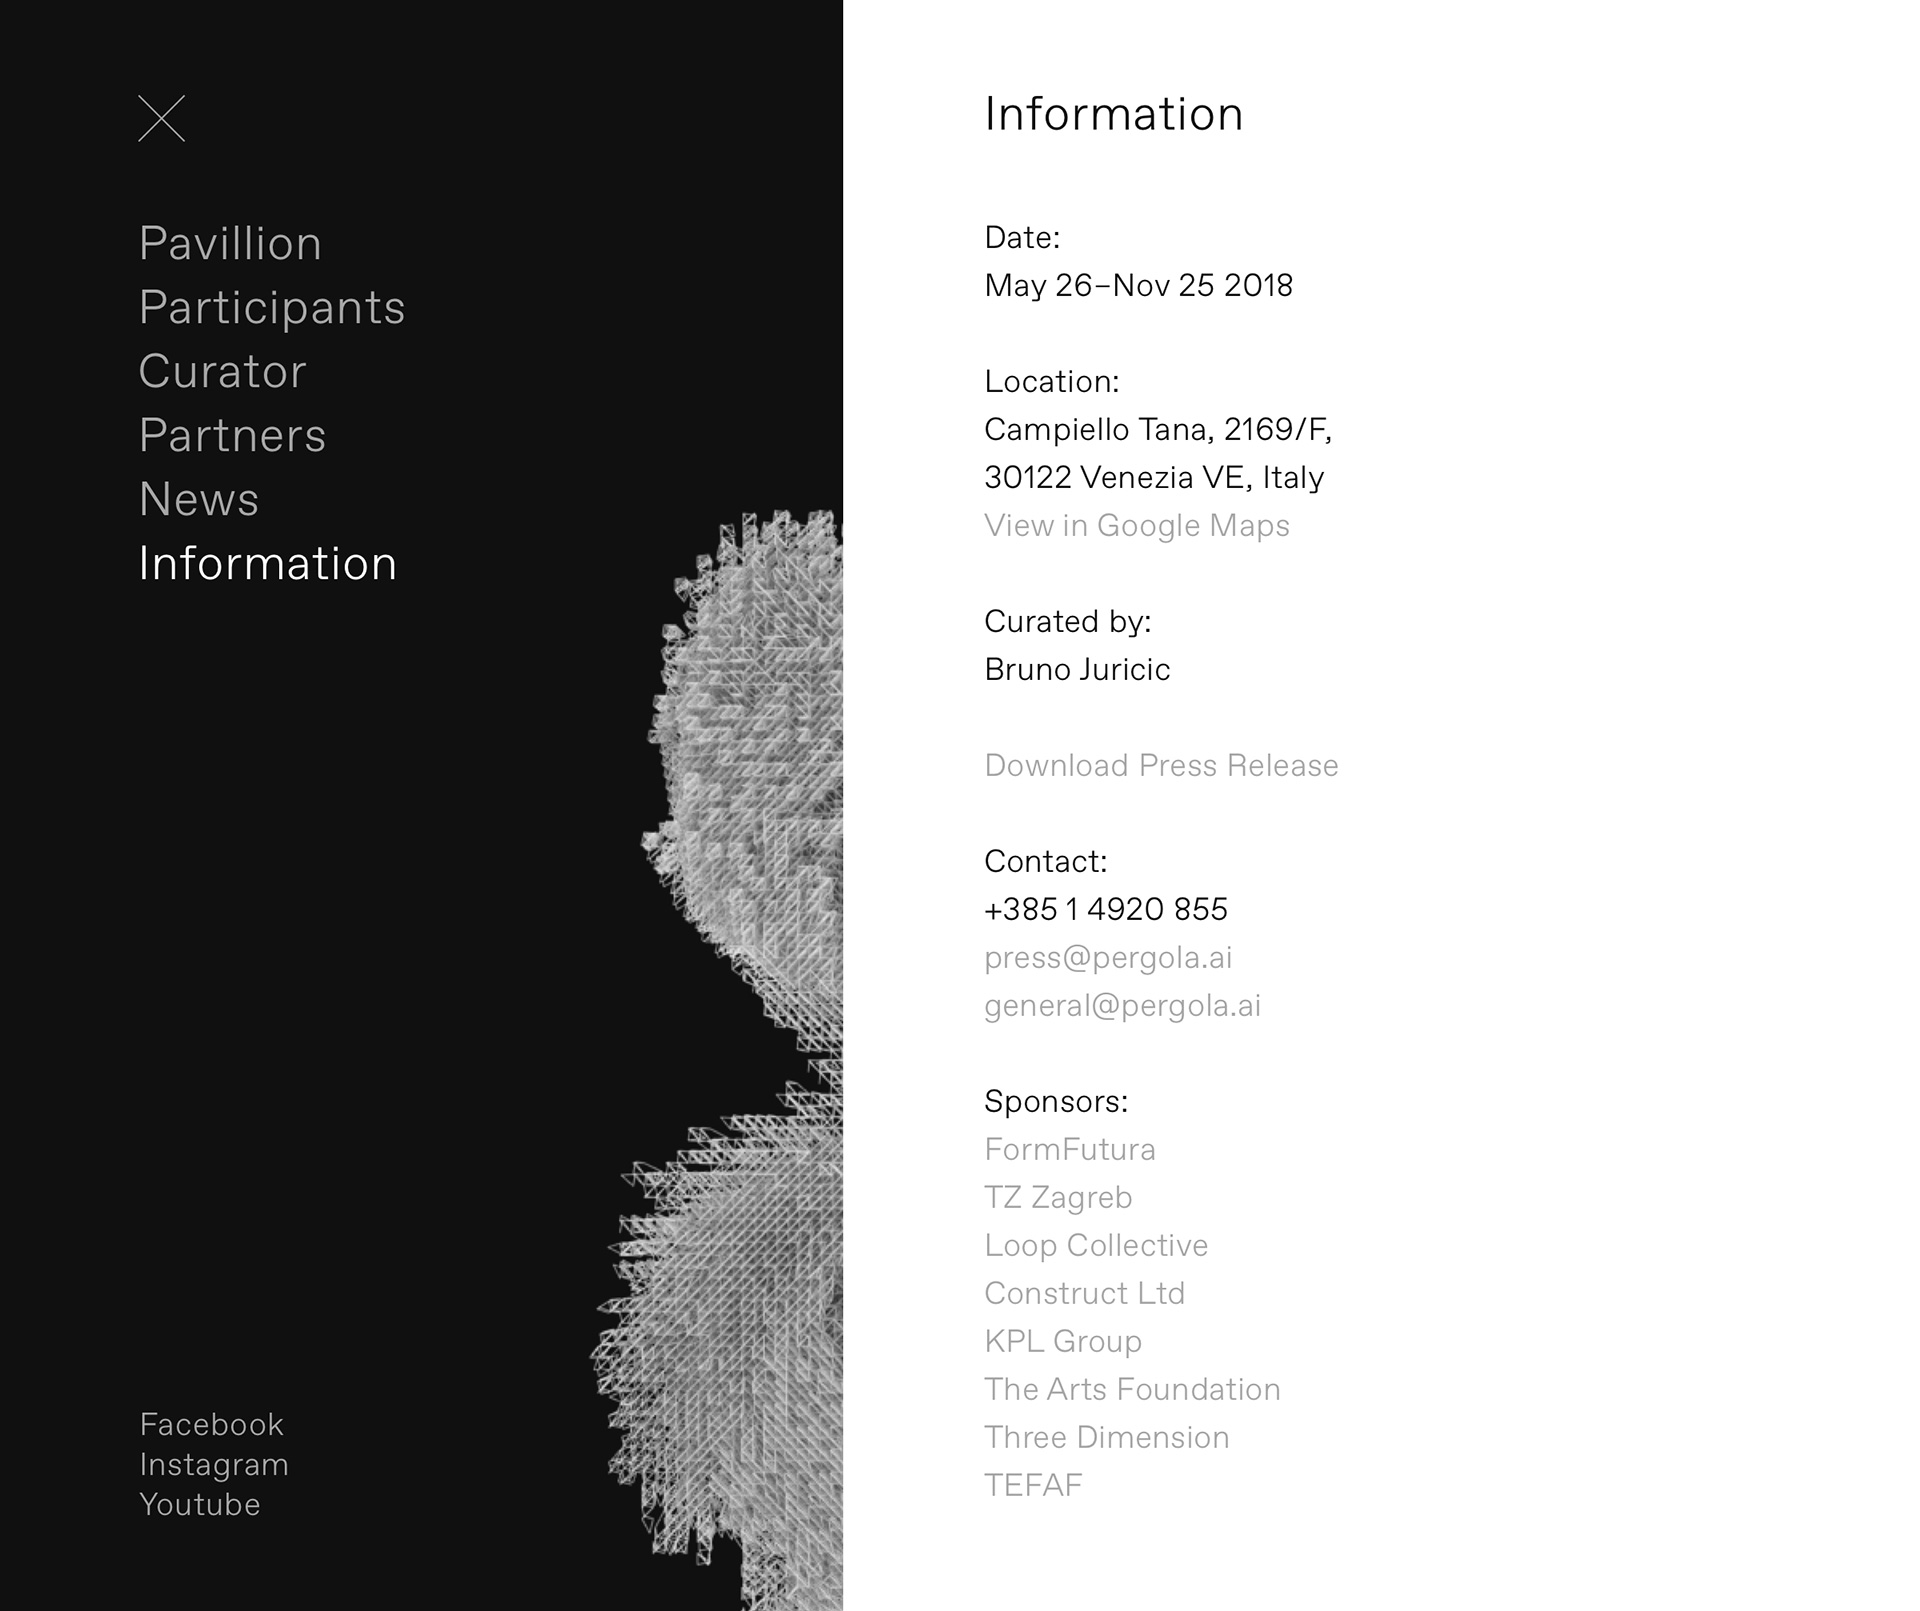 11-Information